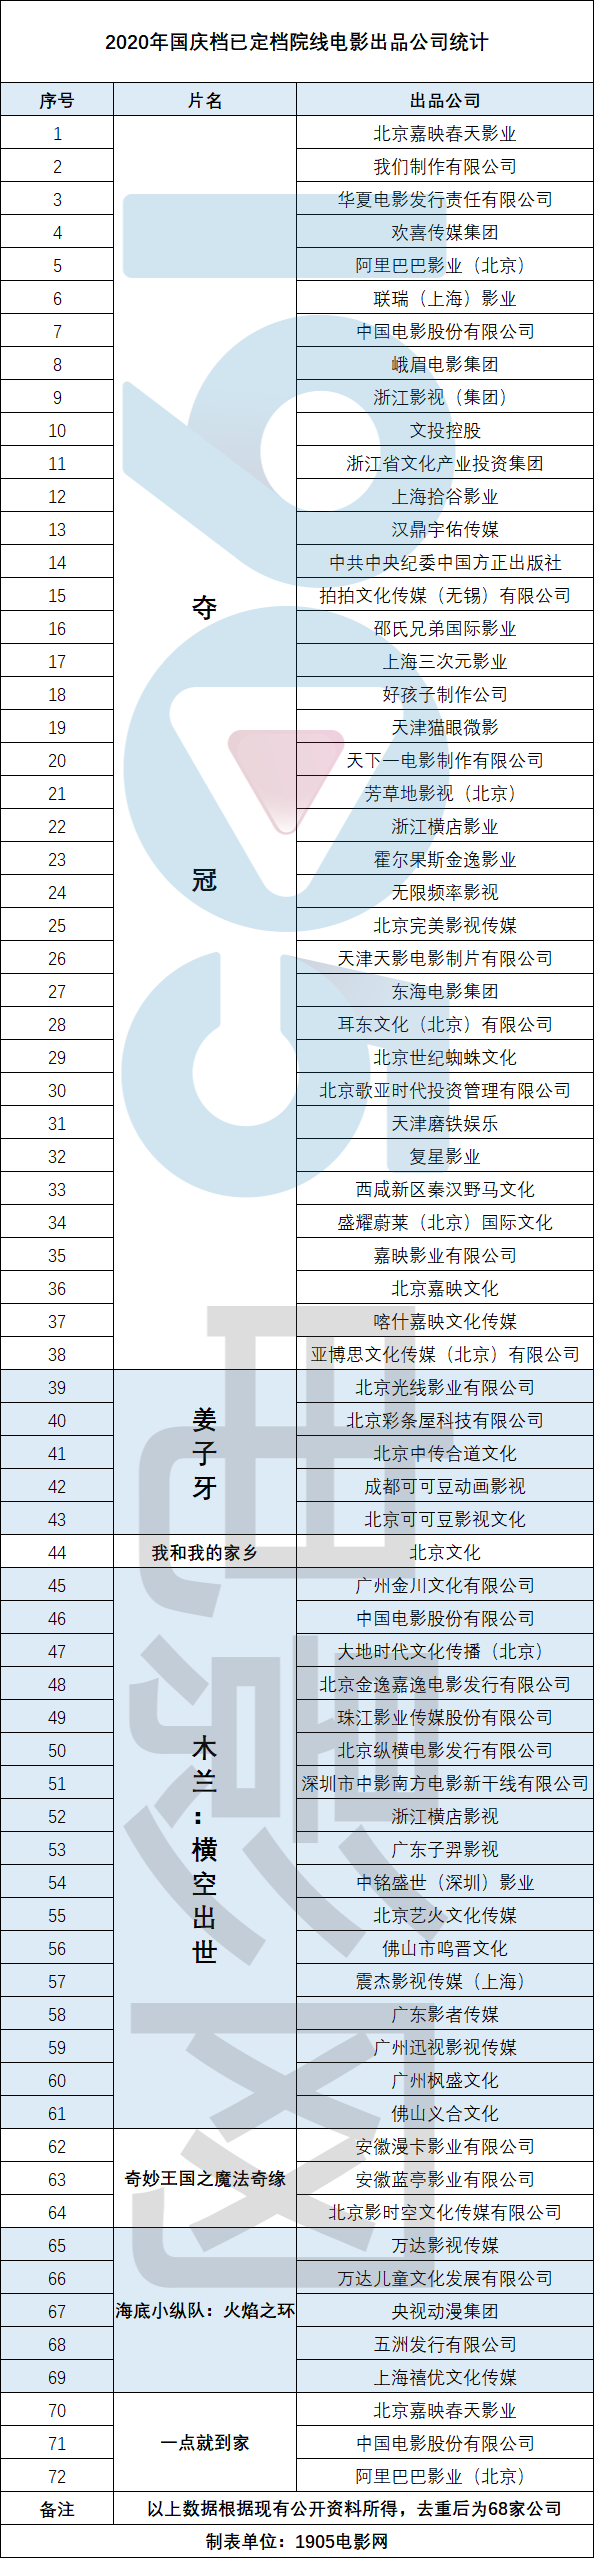 allbet网址:68家影视公司迎大考 2020国庆档能否再创新高? 第3张